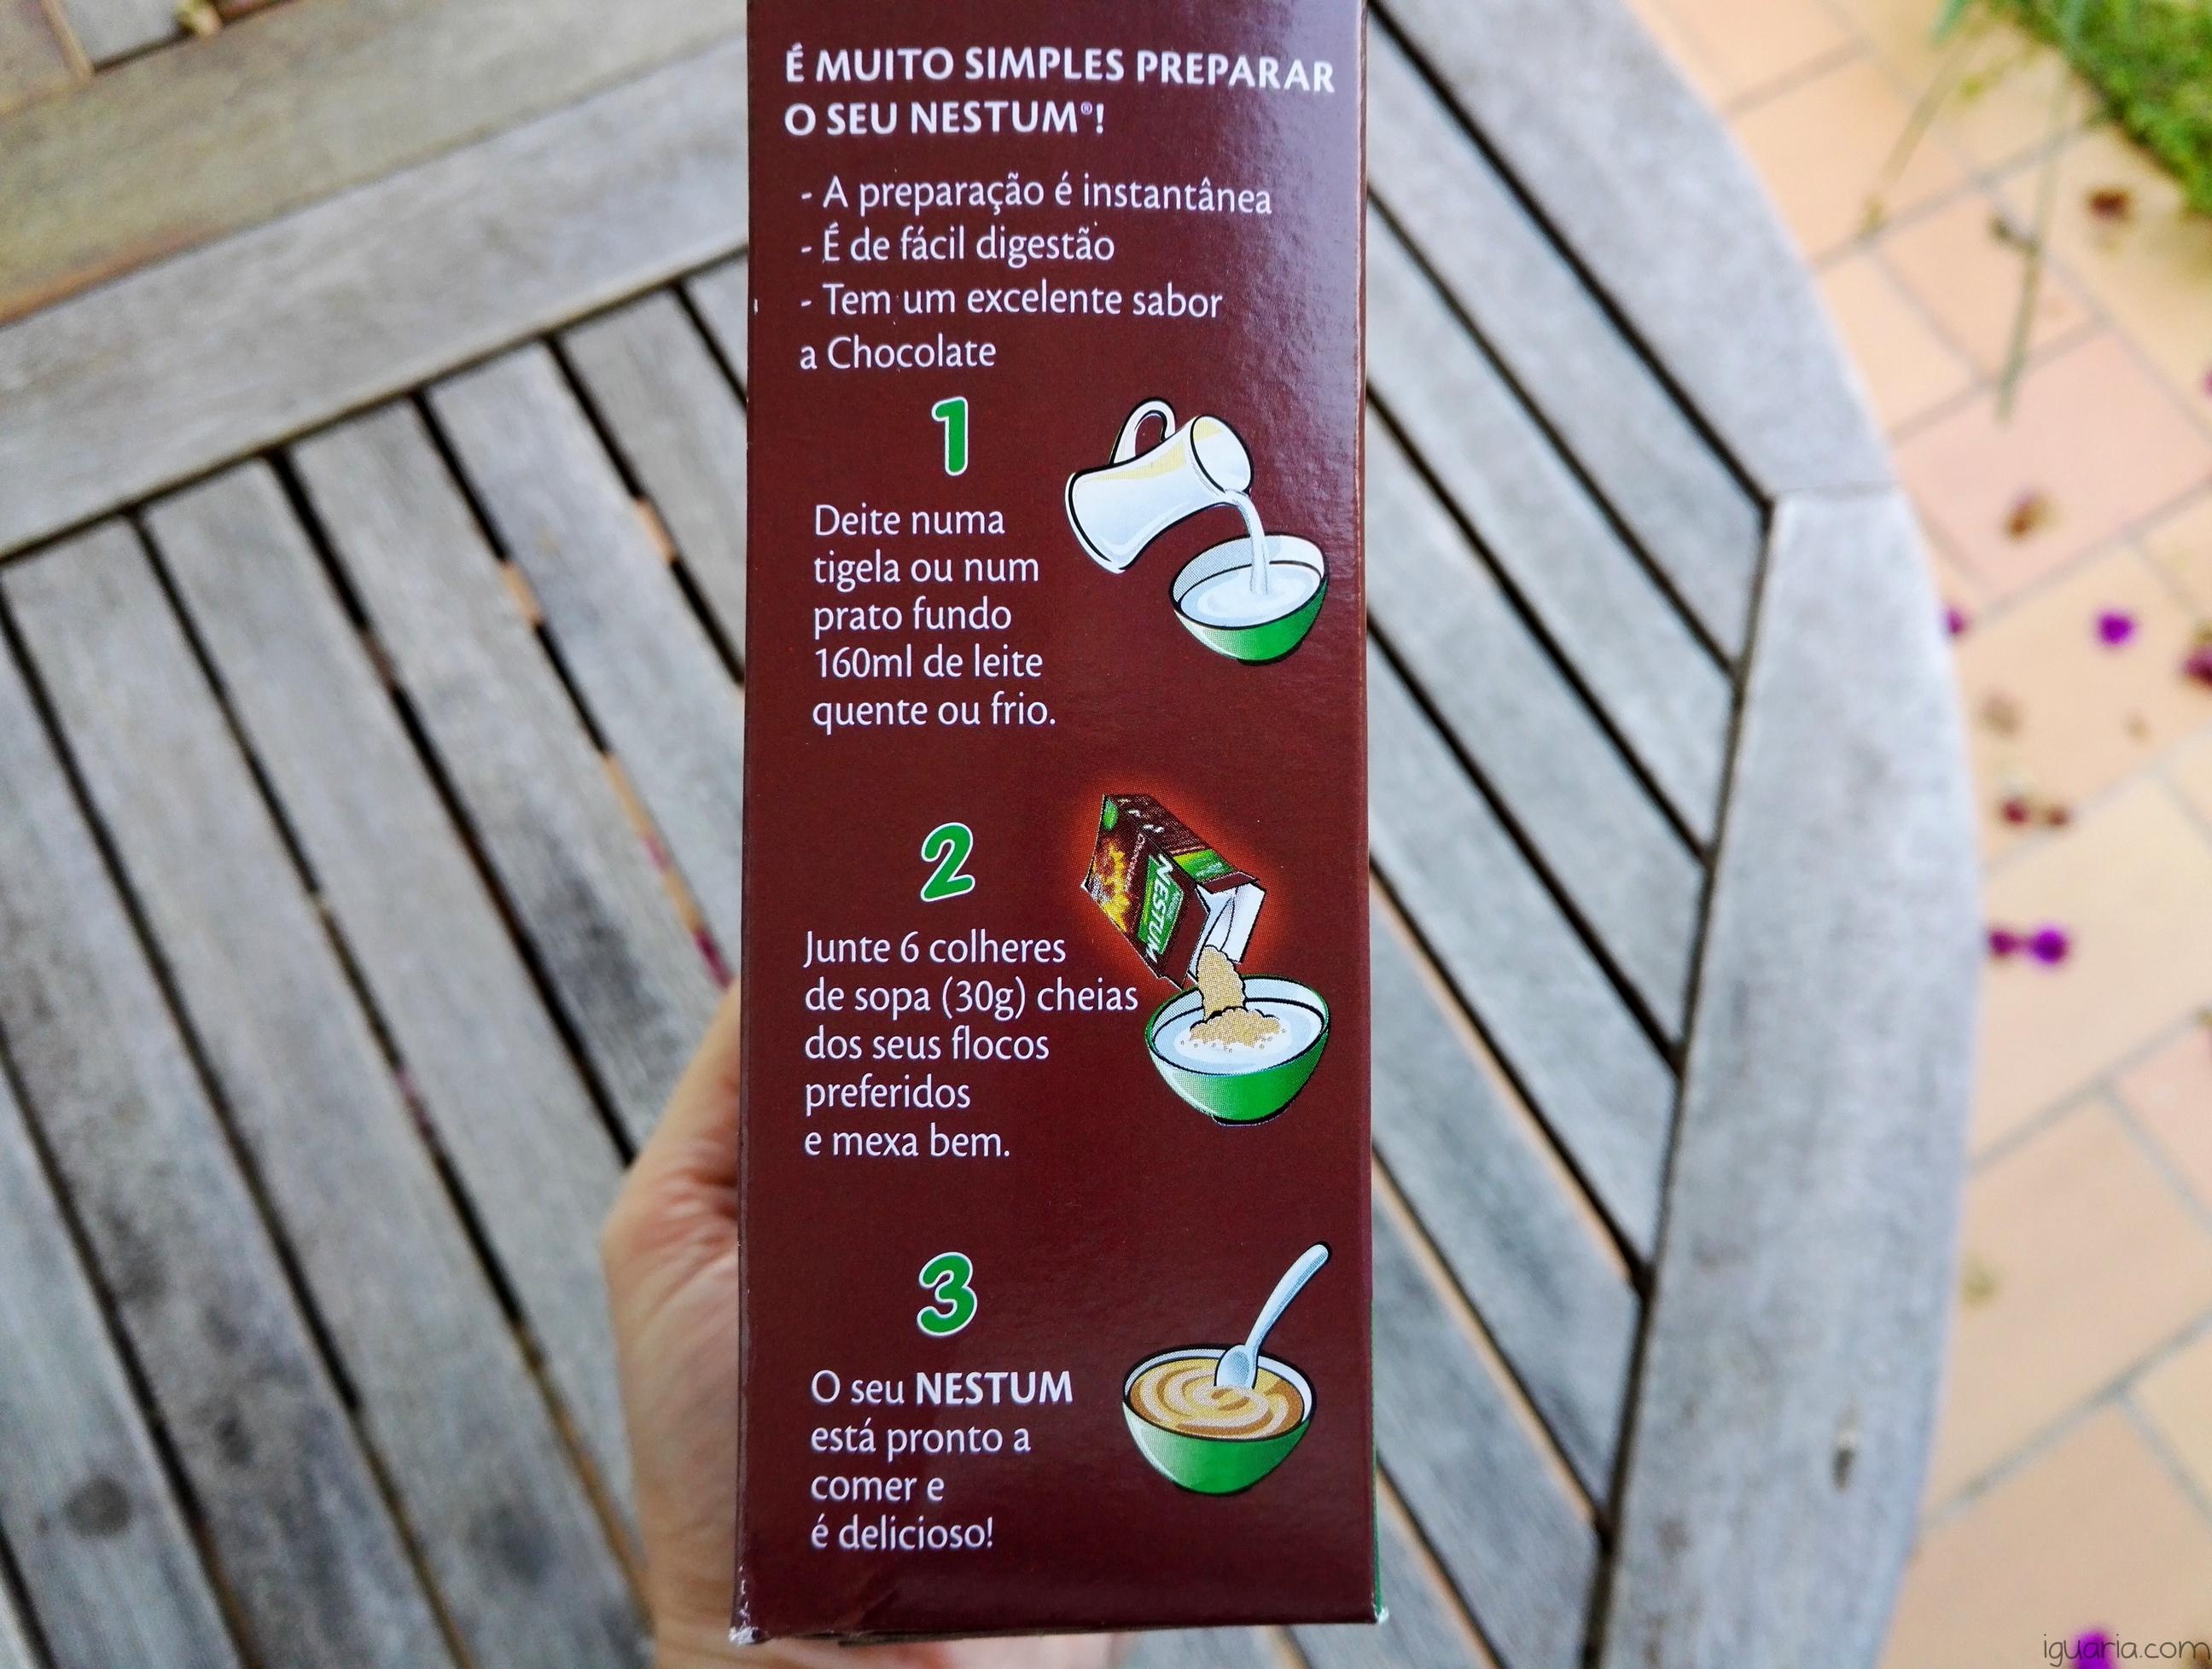 Iguaria_Nestum-Chocolate-Instrucoes-Preparacao